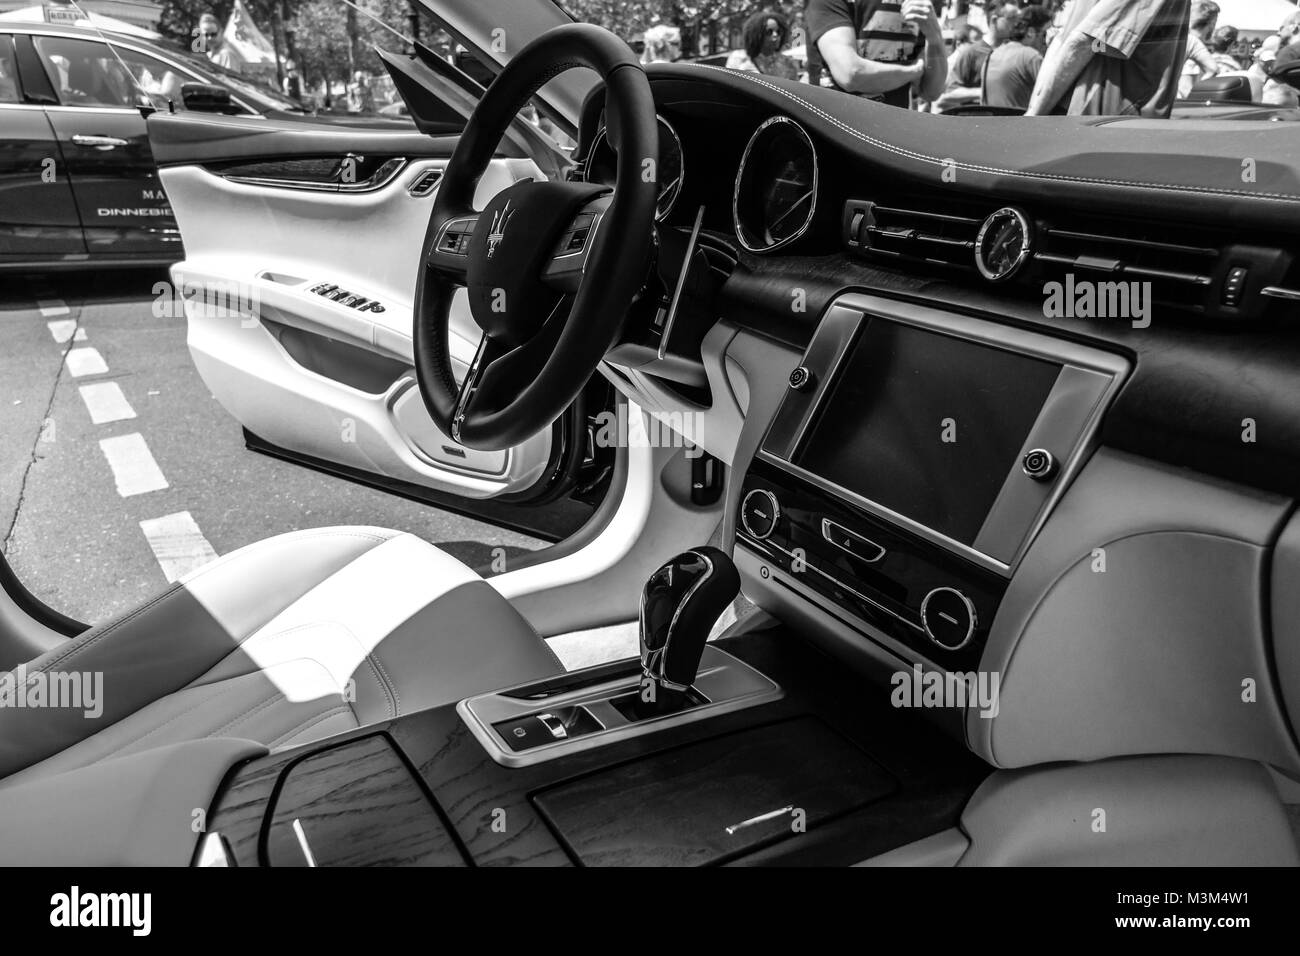 Berlin June 05 2016 Interior Of Full Size Luxury Car Maserati Stock Photo Alamy